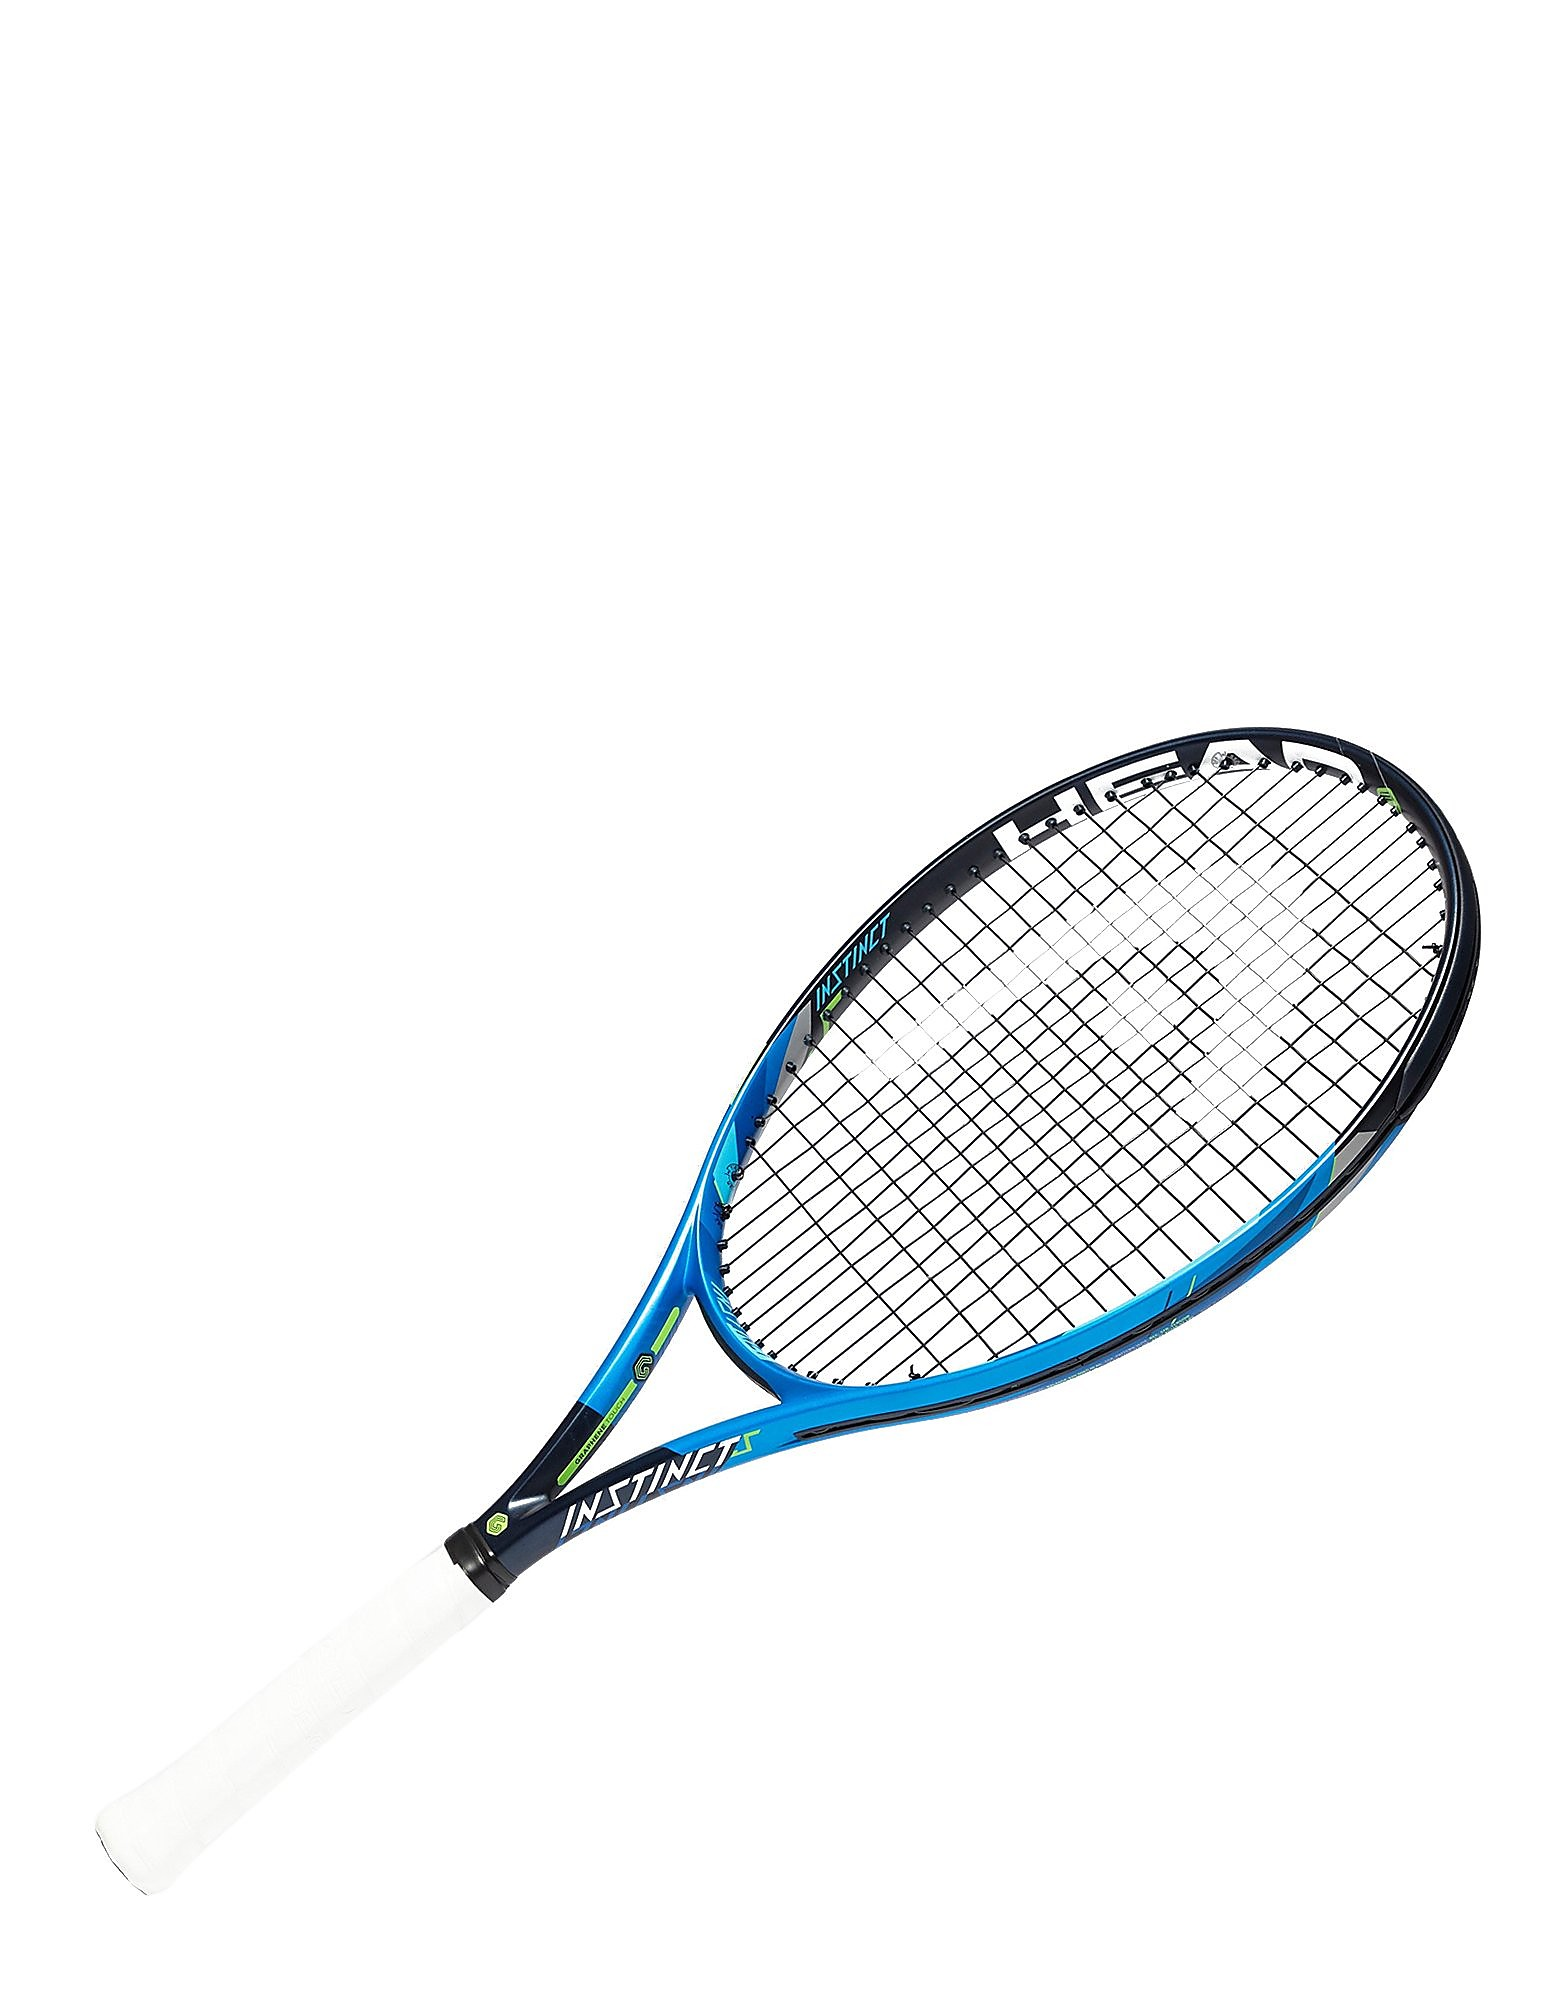 Head Graphene Touch Instinct S Tennis Racket